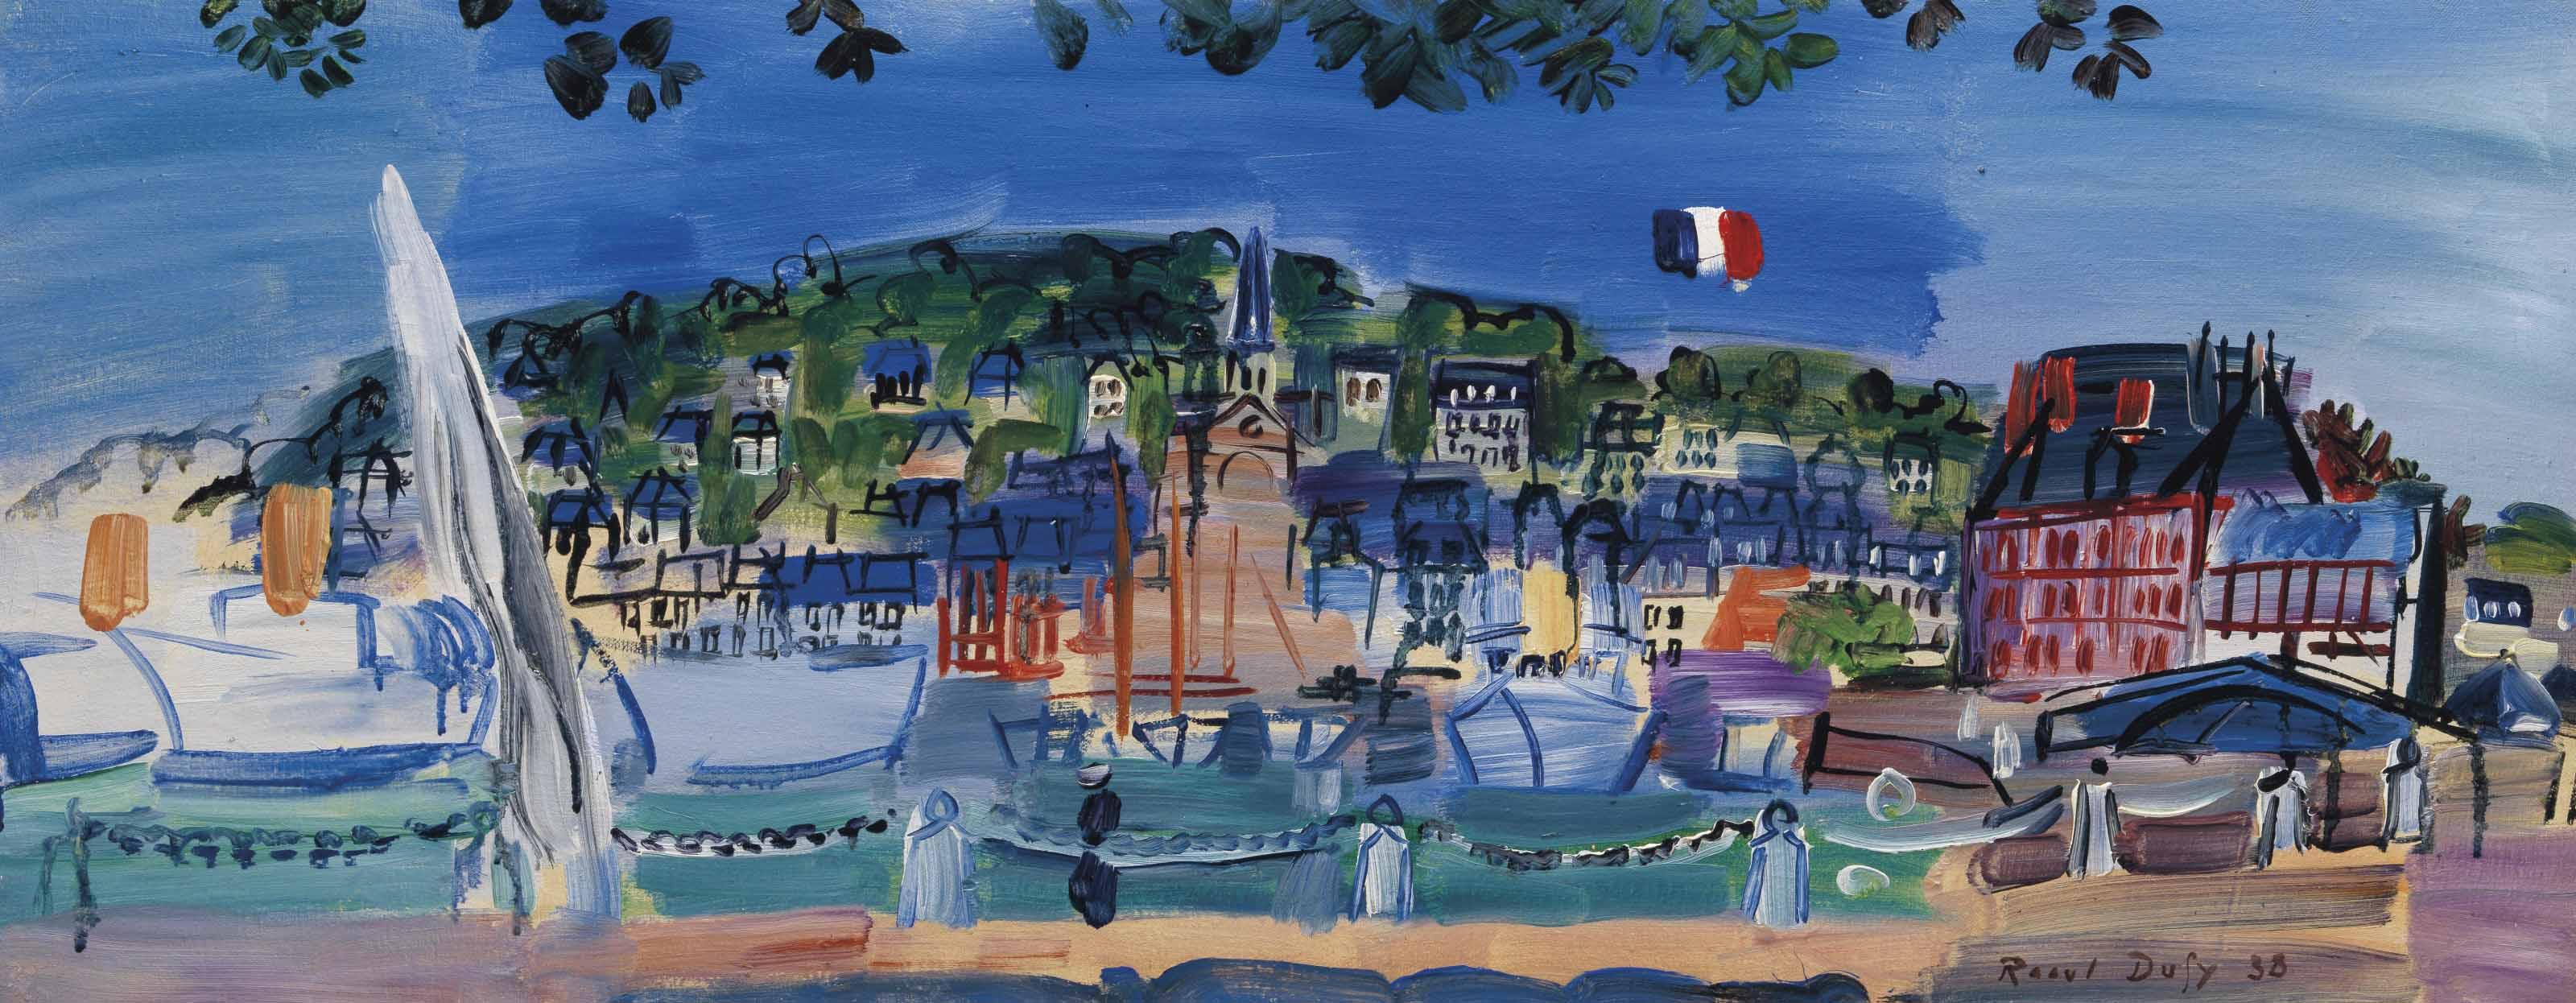 Le bassin de Deauville